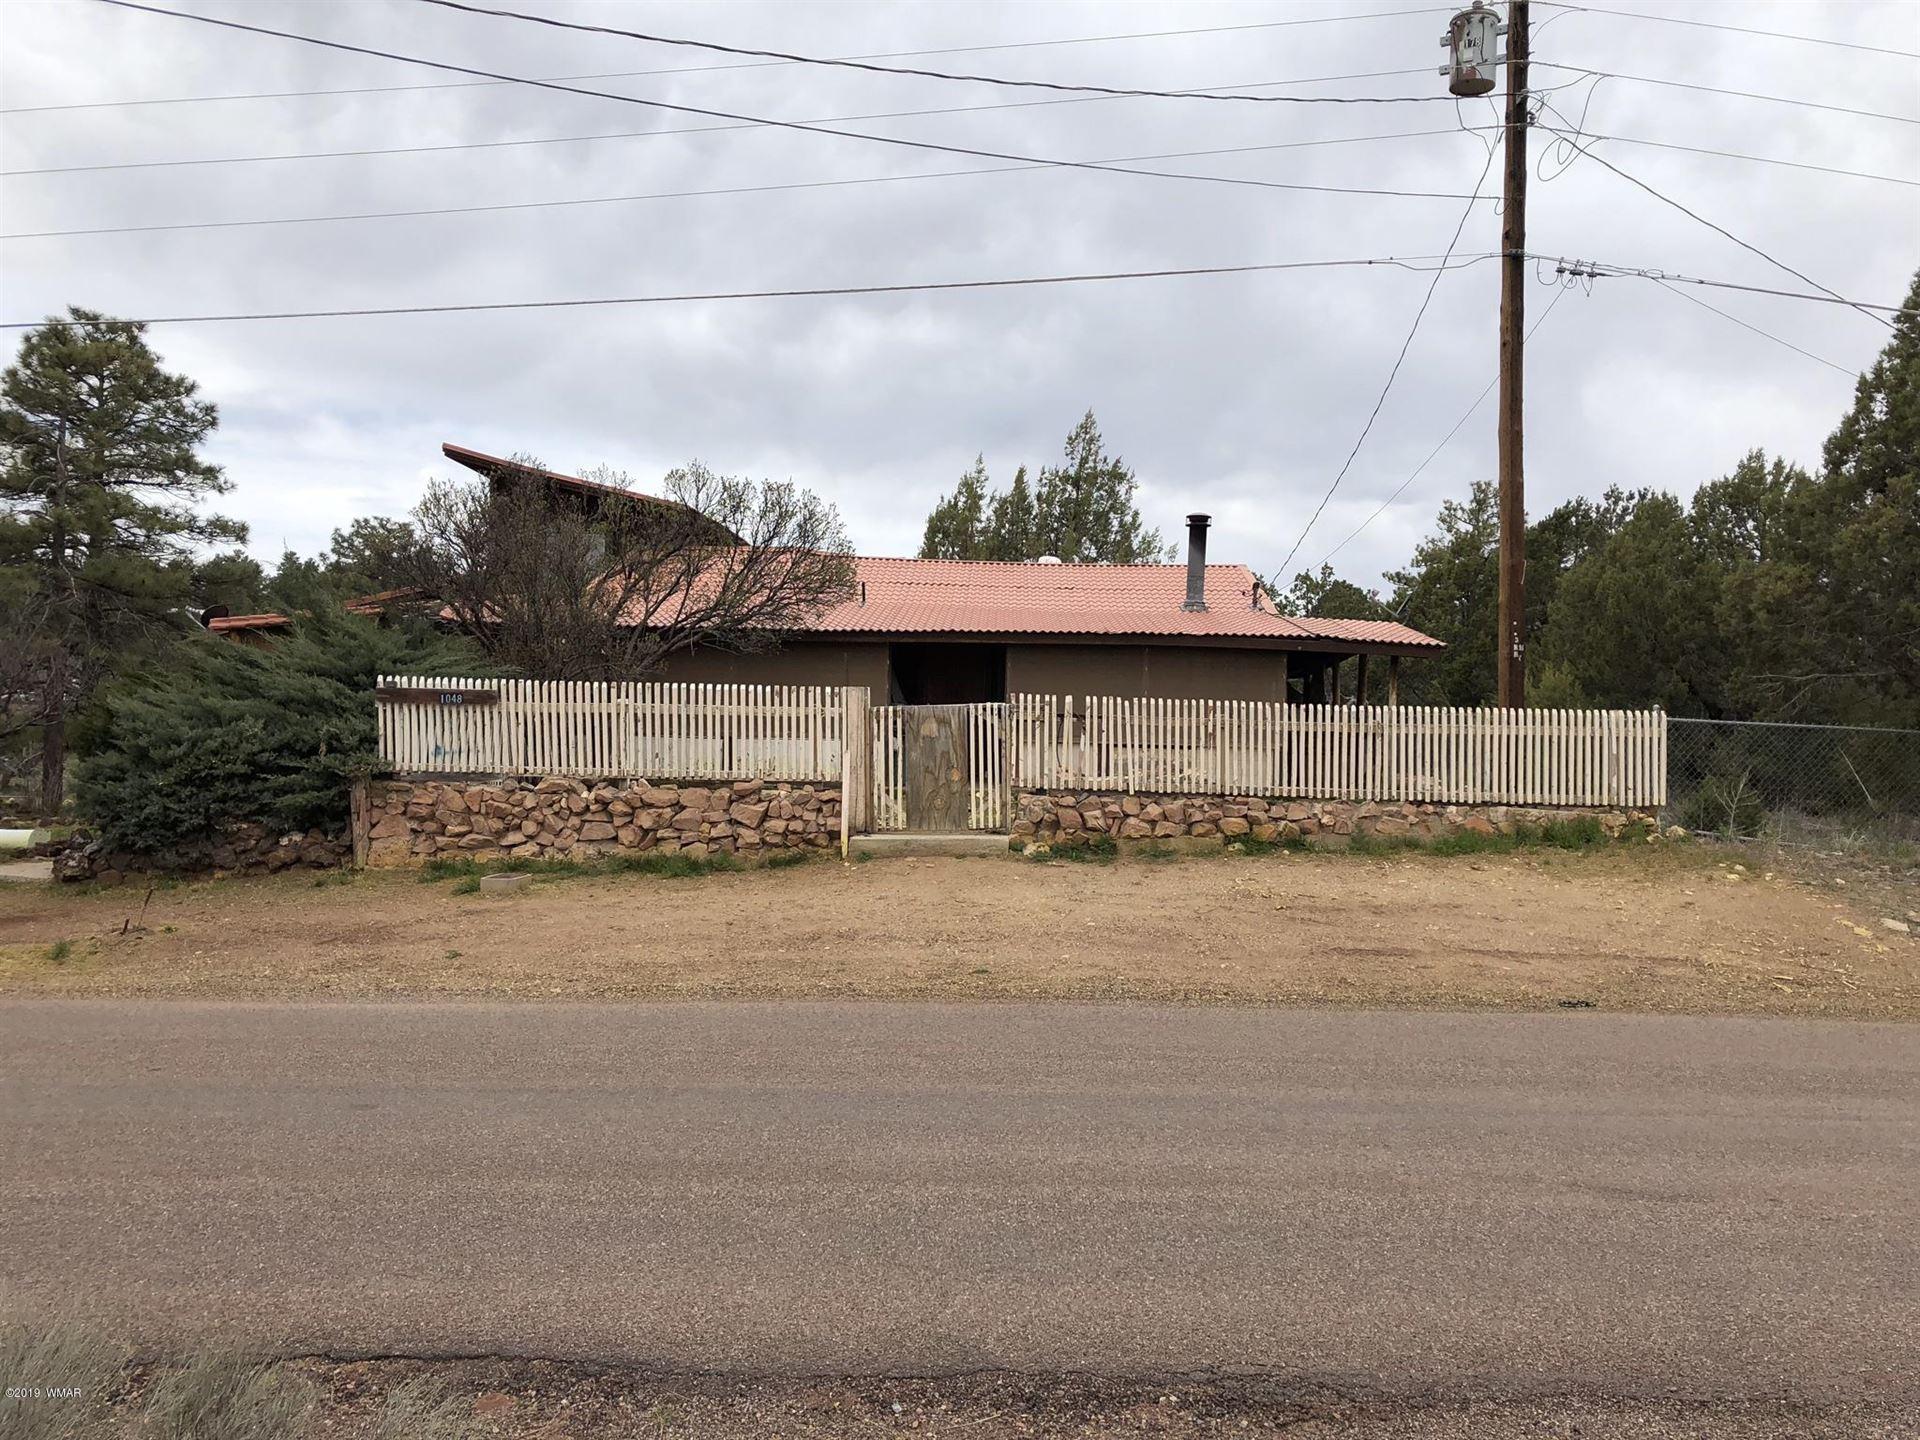 Photo for 1048 Aspen Way, Show Low, AZ 85901 (MLS # 236075)